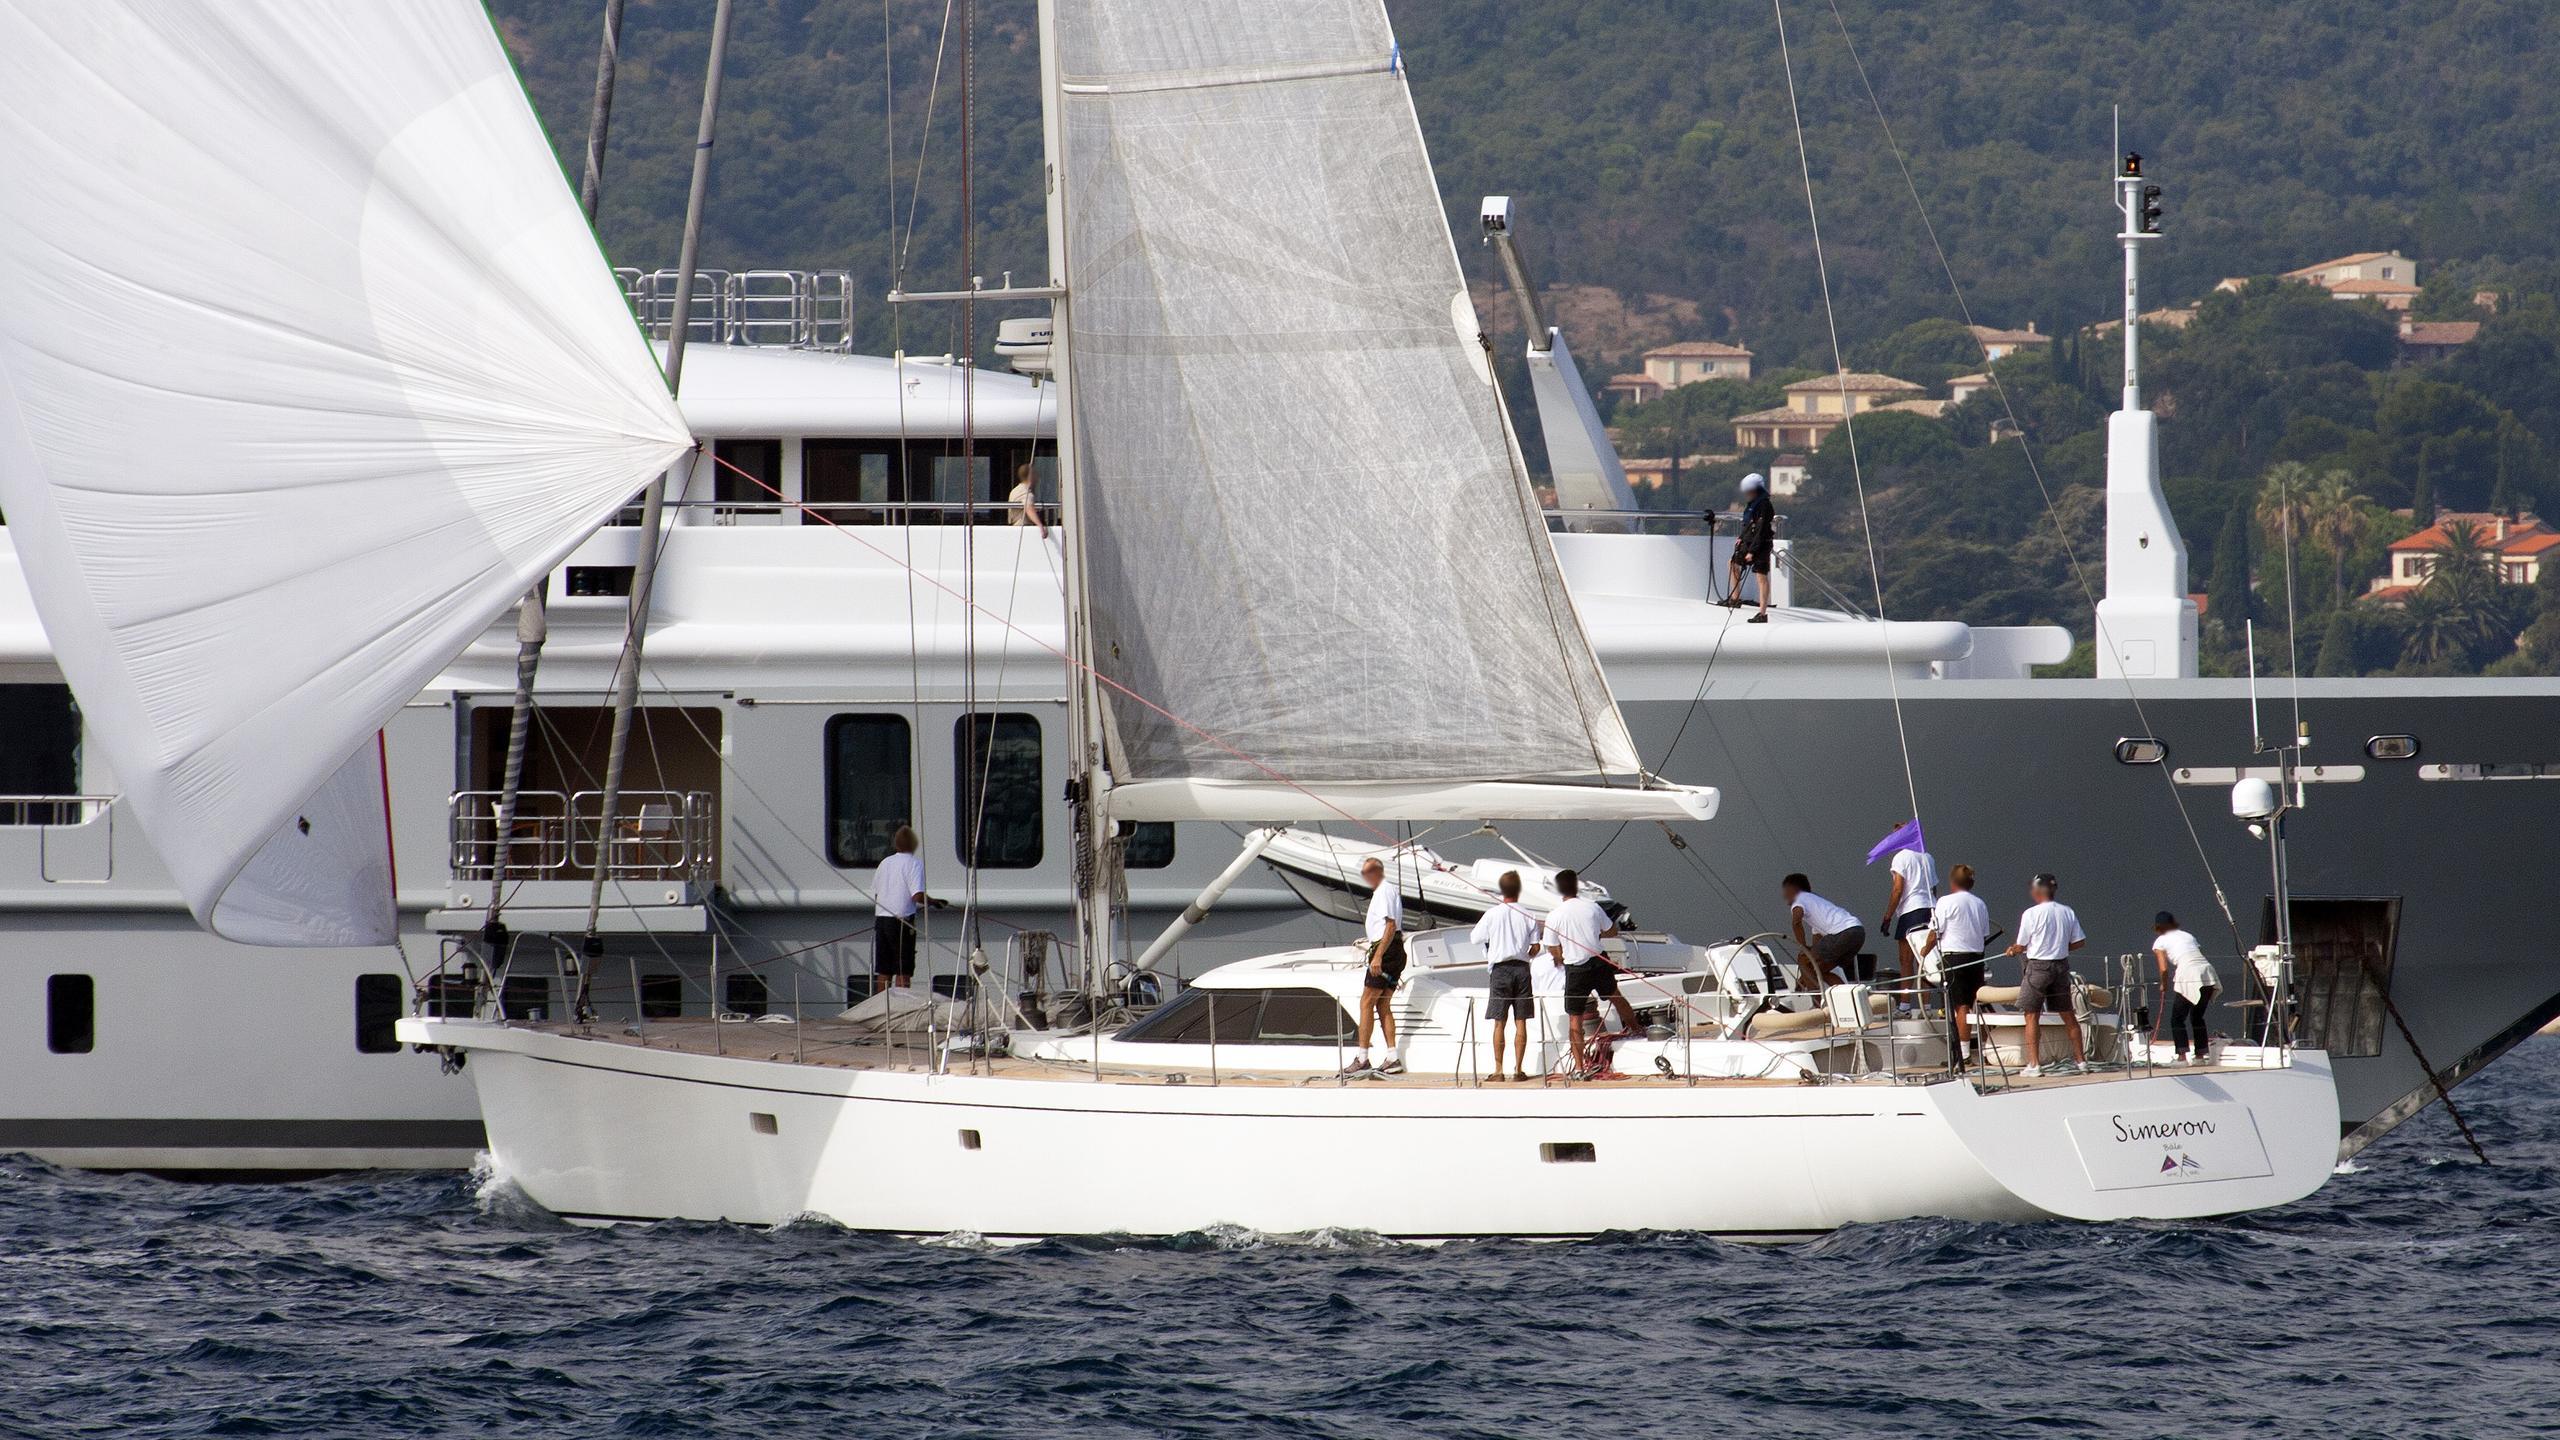 simeron-sailing-yacht-cnb-82-2004-25m-profile